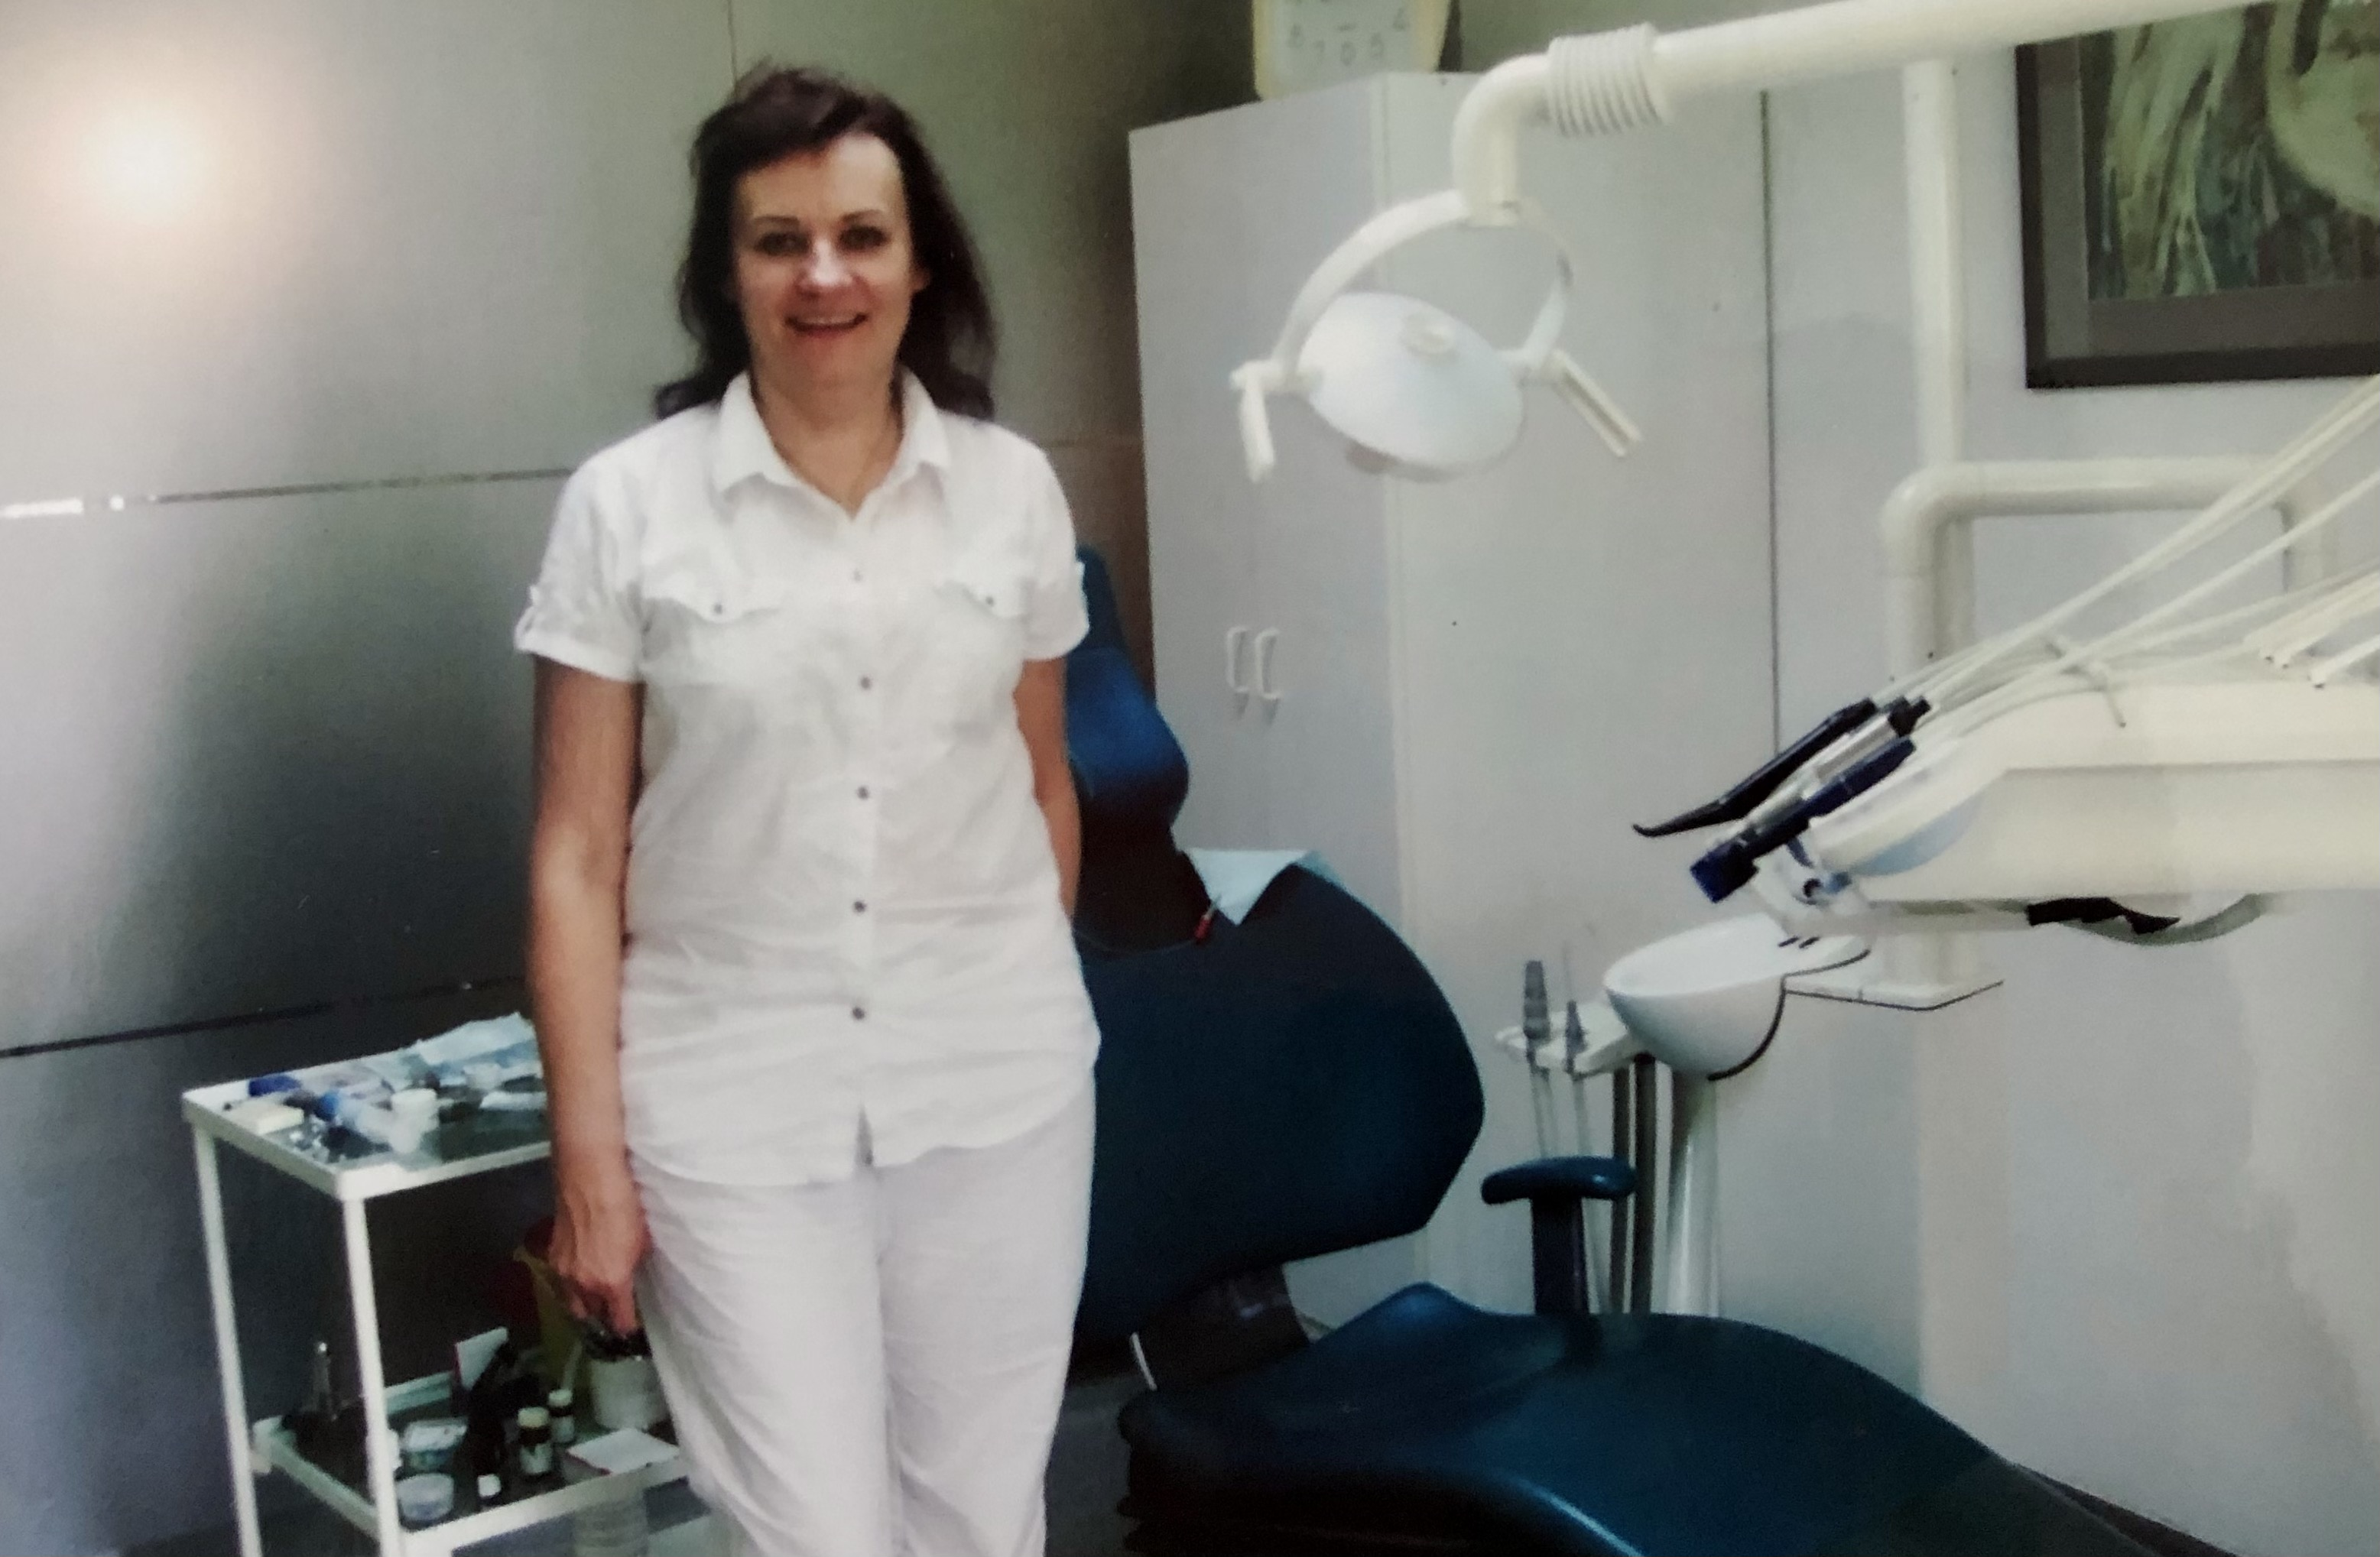 Odontologija anksčiau ir dabar. Interviu su odontologe Raimonda Stankevičiene